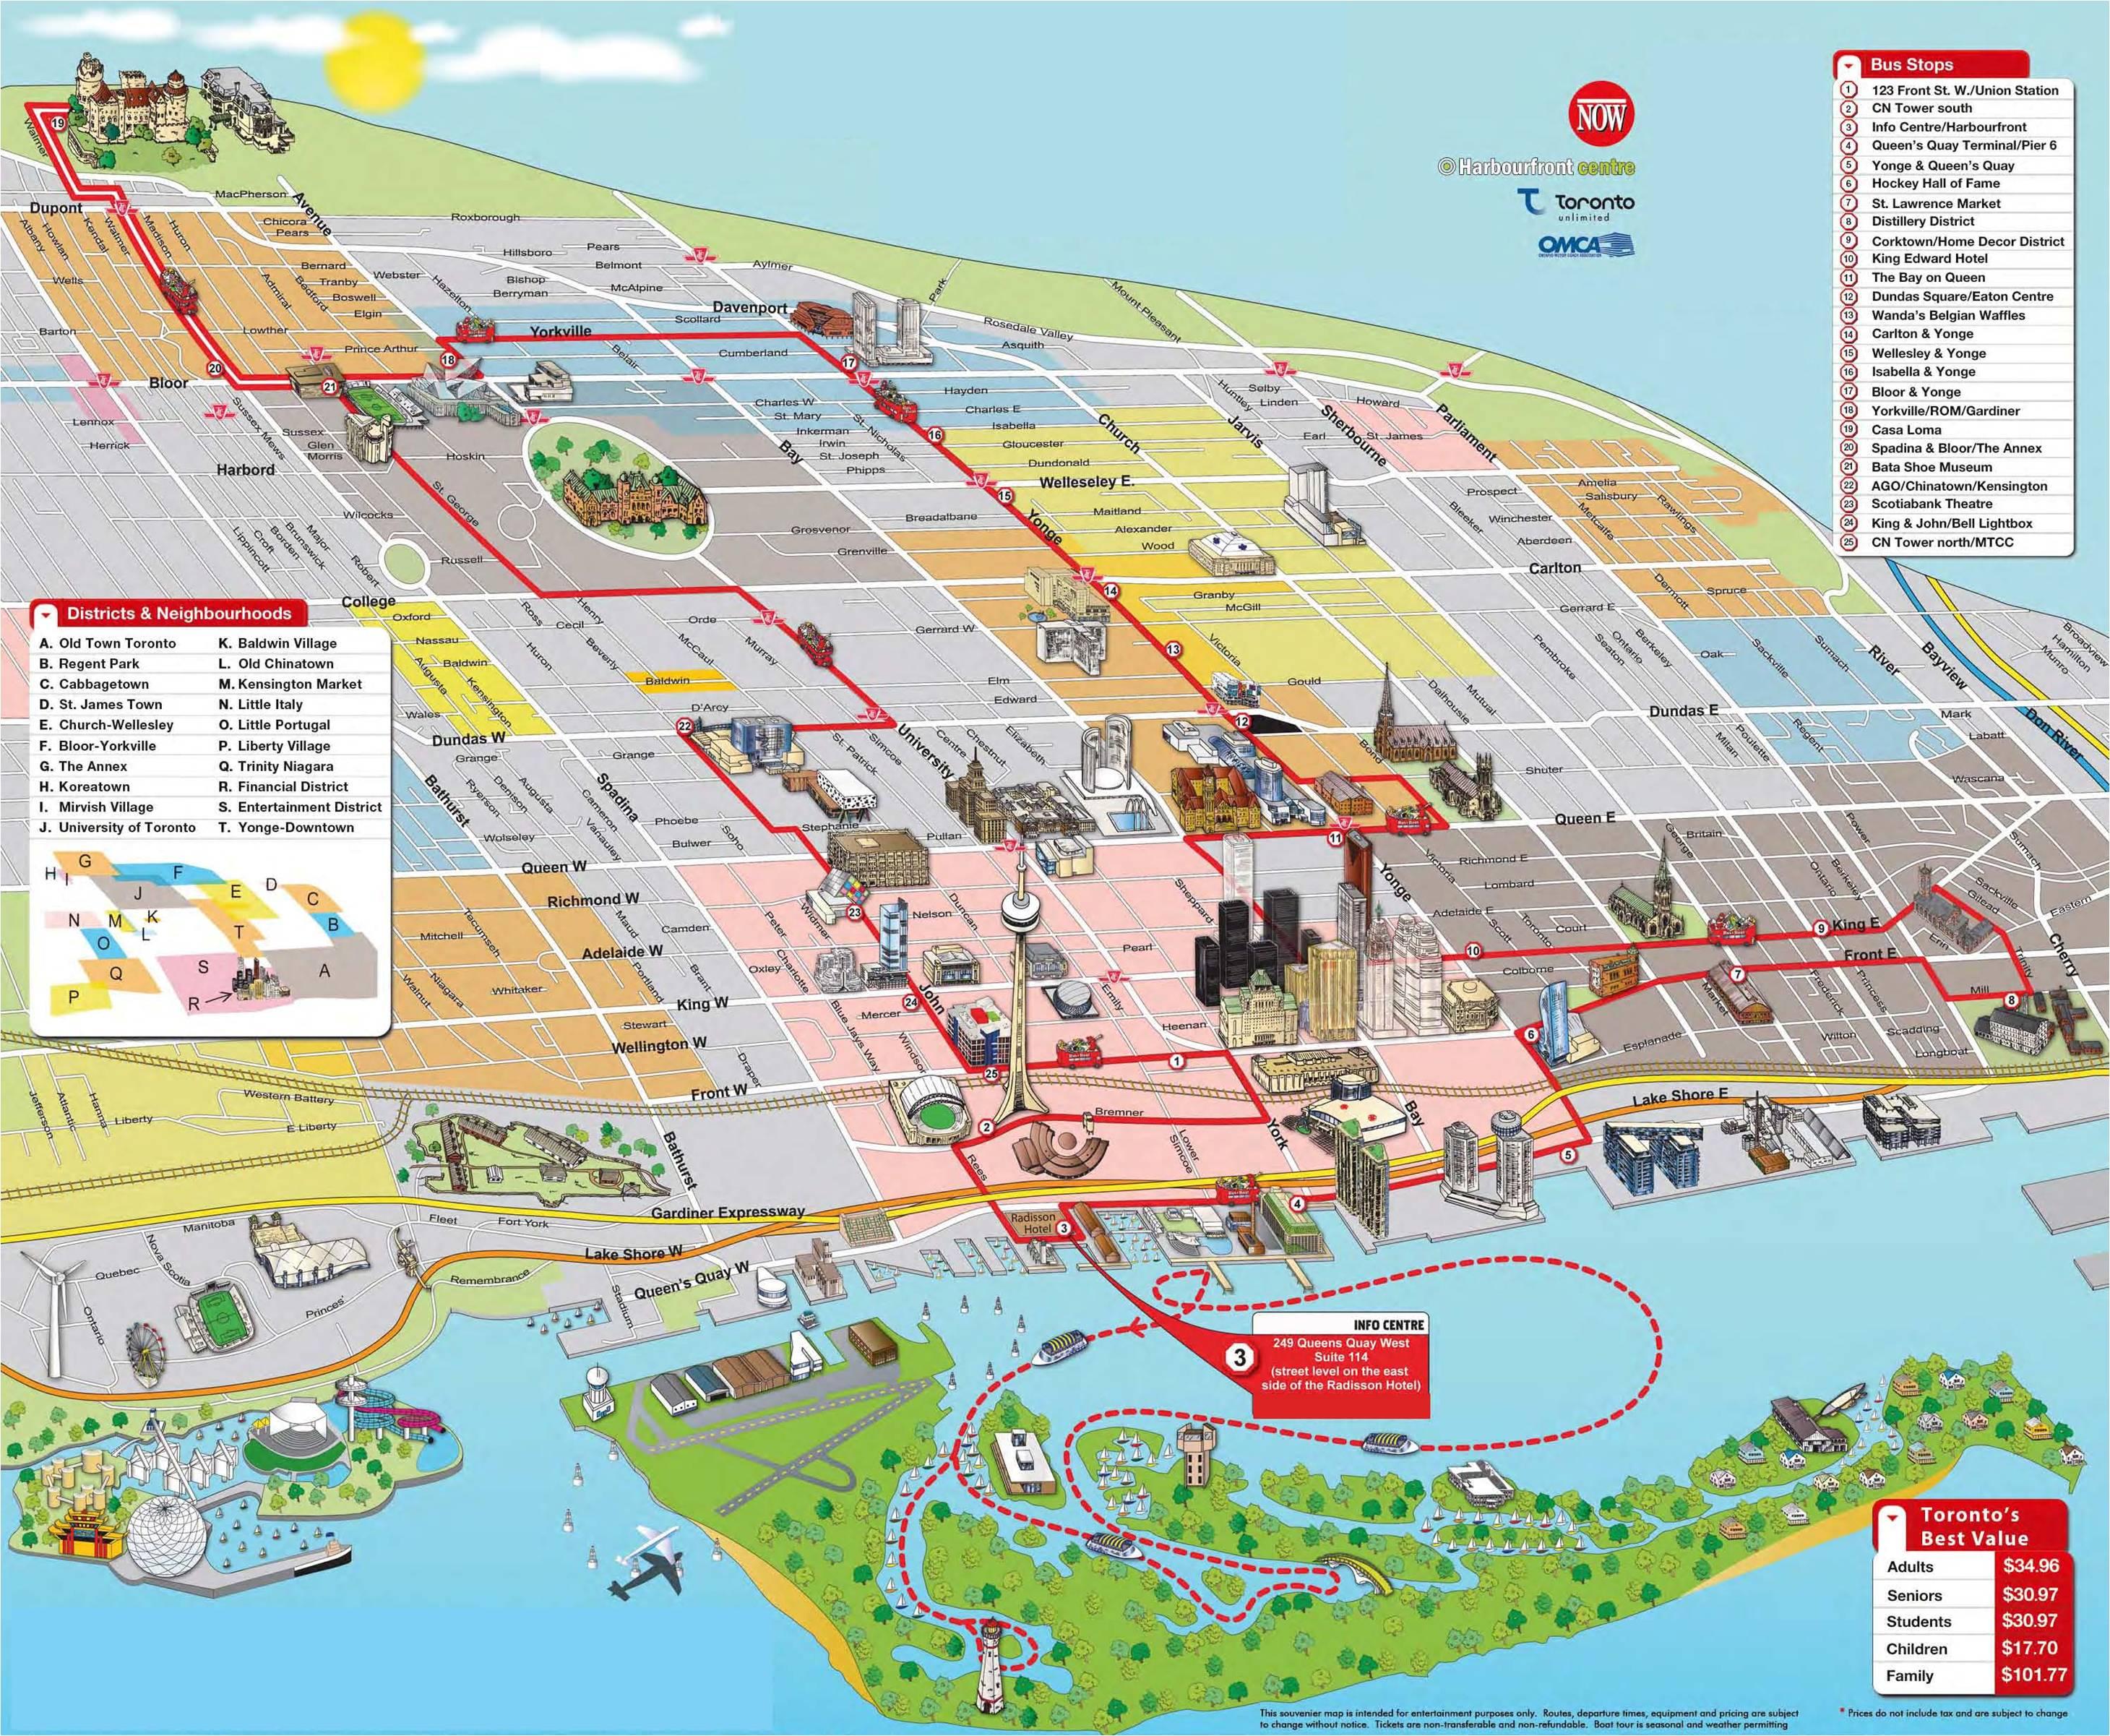 Mapa de la ciudad de Toronto